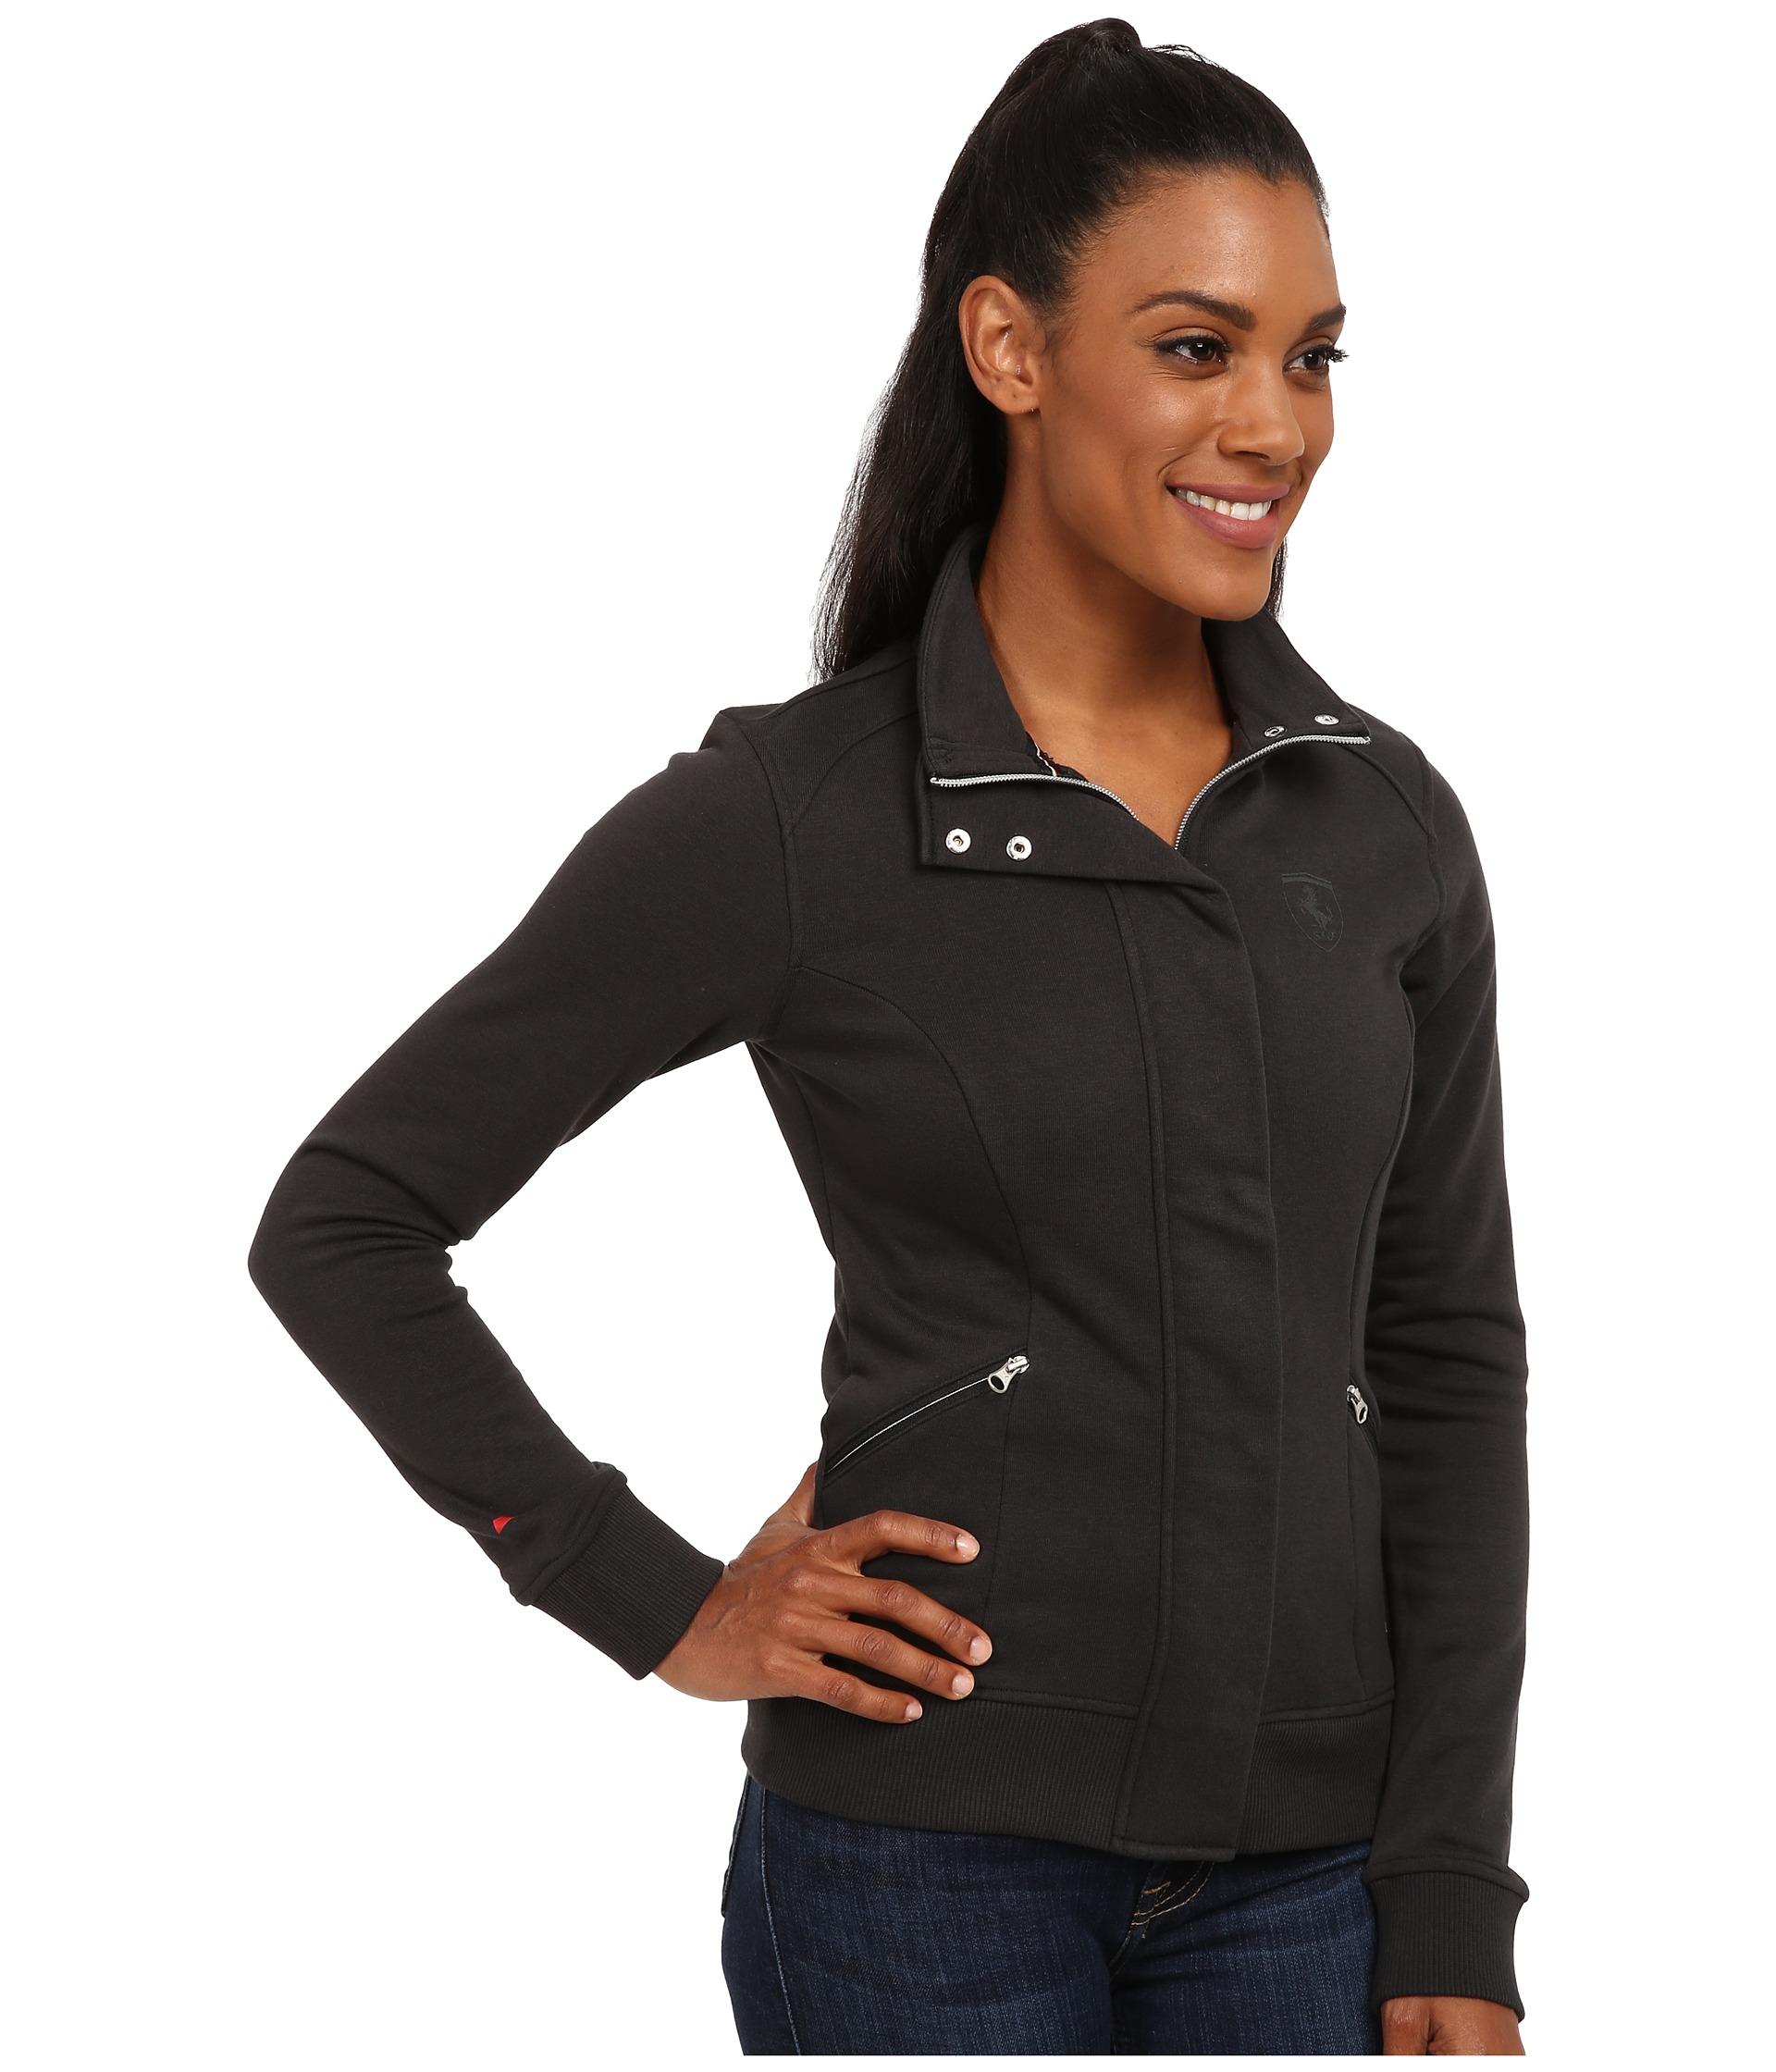 p clothing ferrari performance gorgeous backpack sale lrg for mens puma backpacks lux black